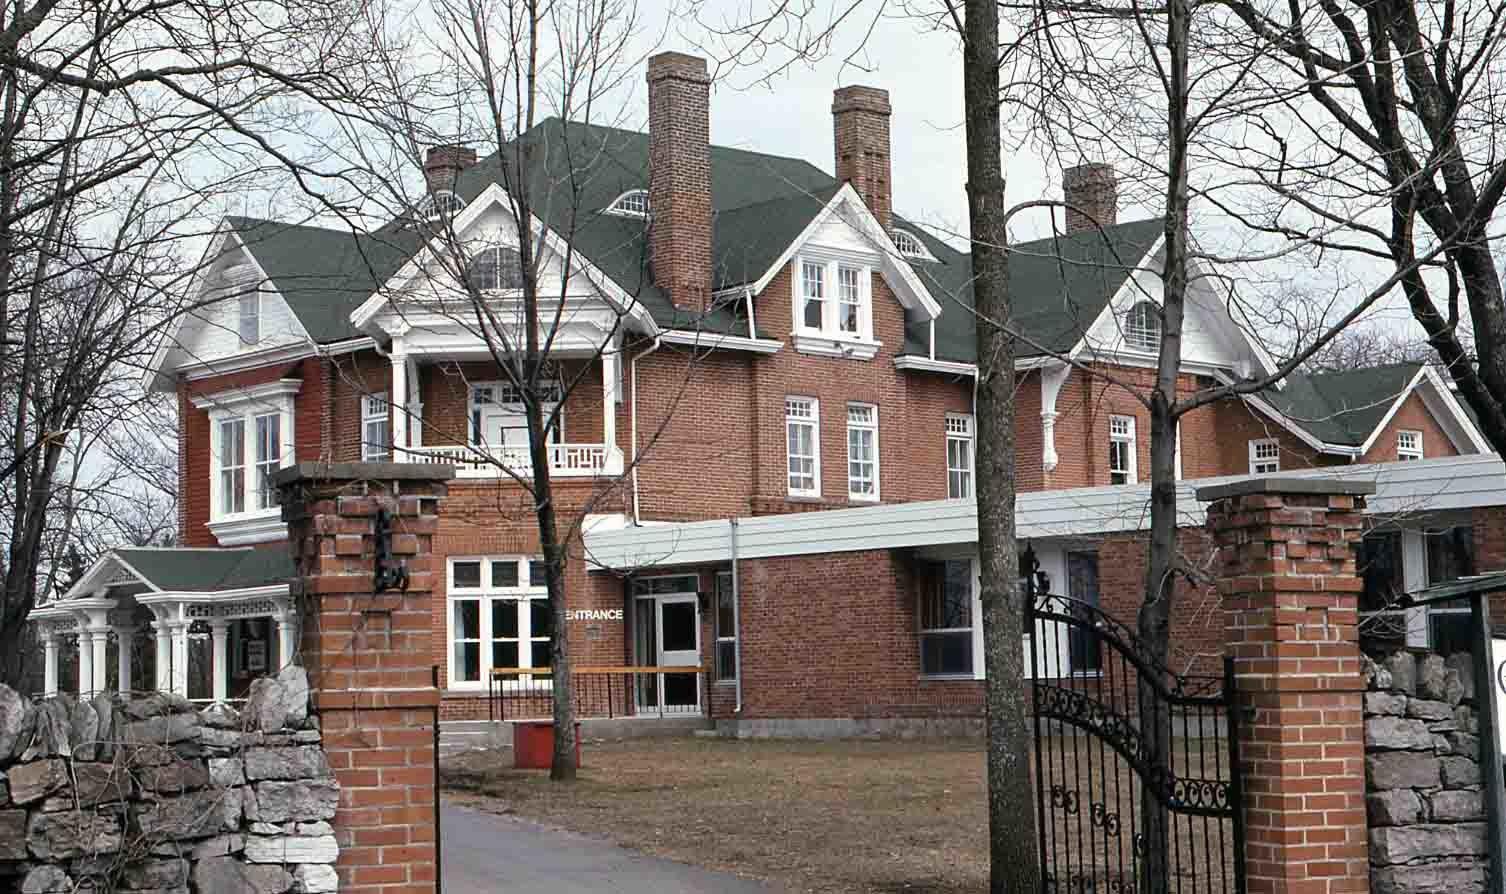 Case Manor, Boyd Estate, Bobcaygeon